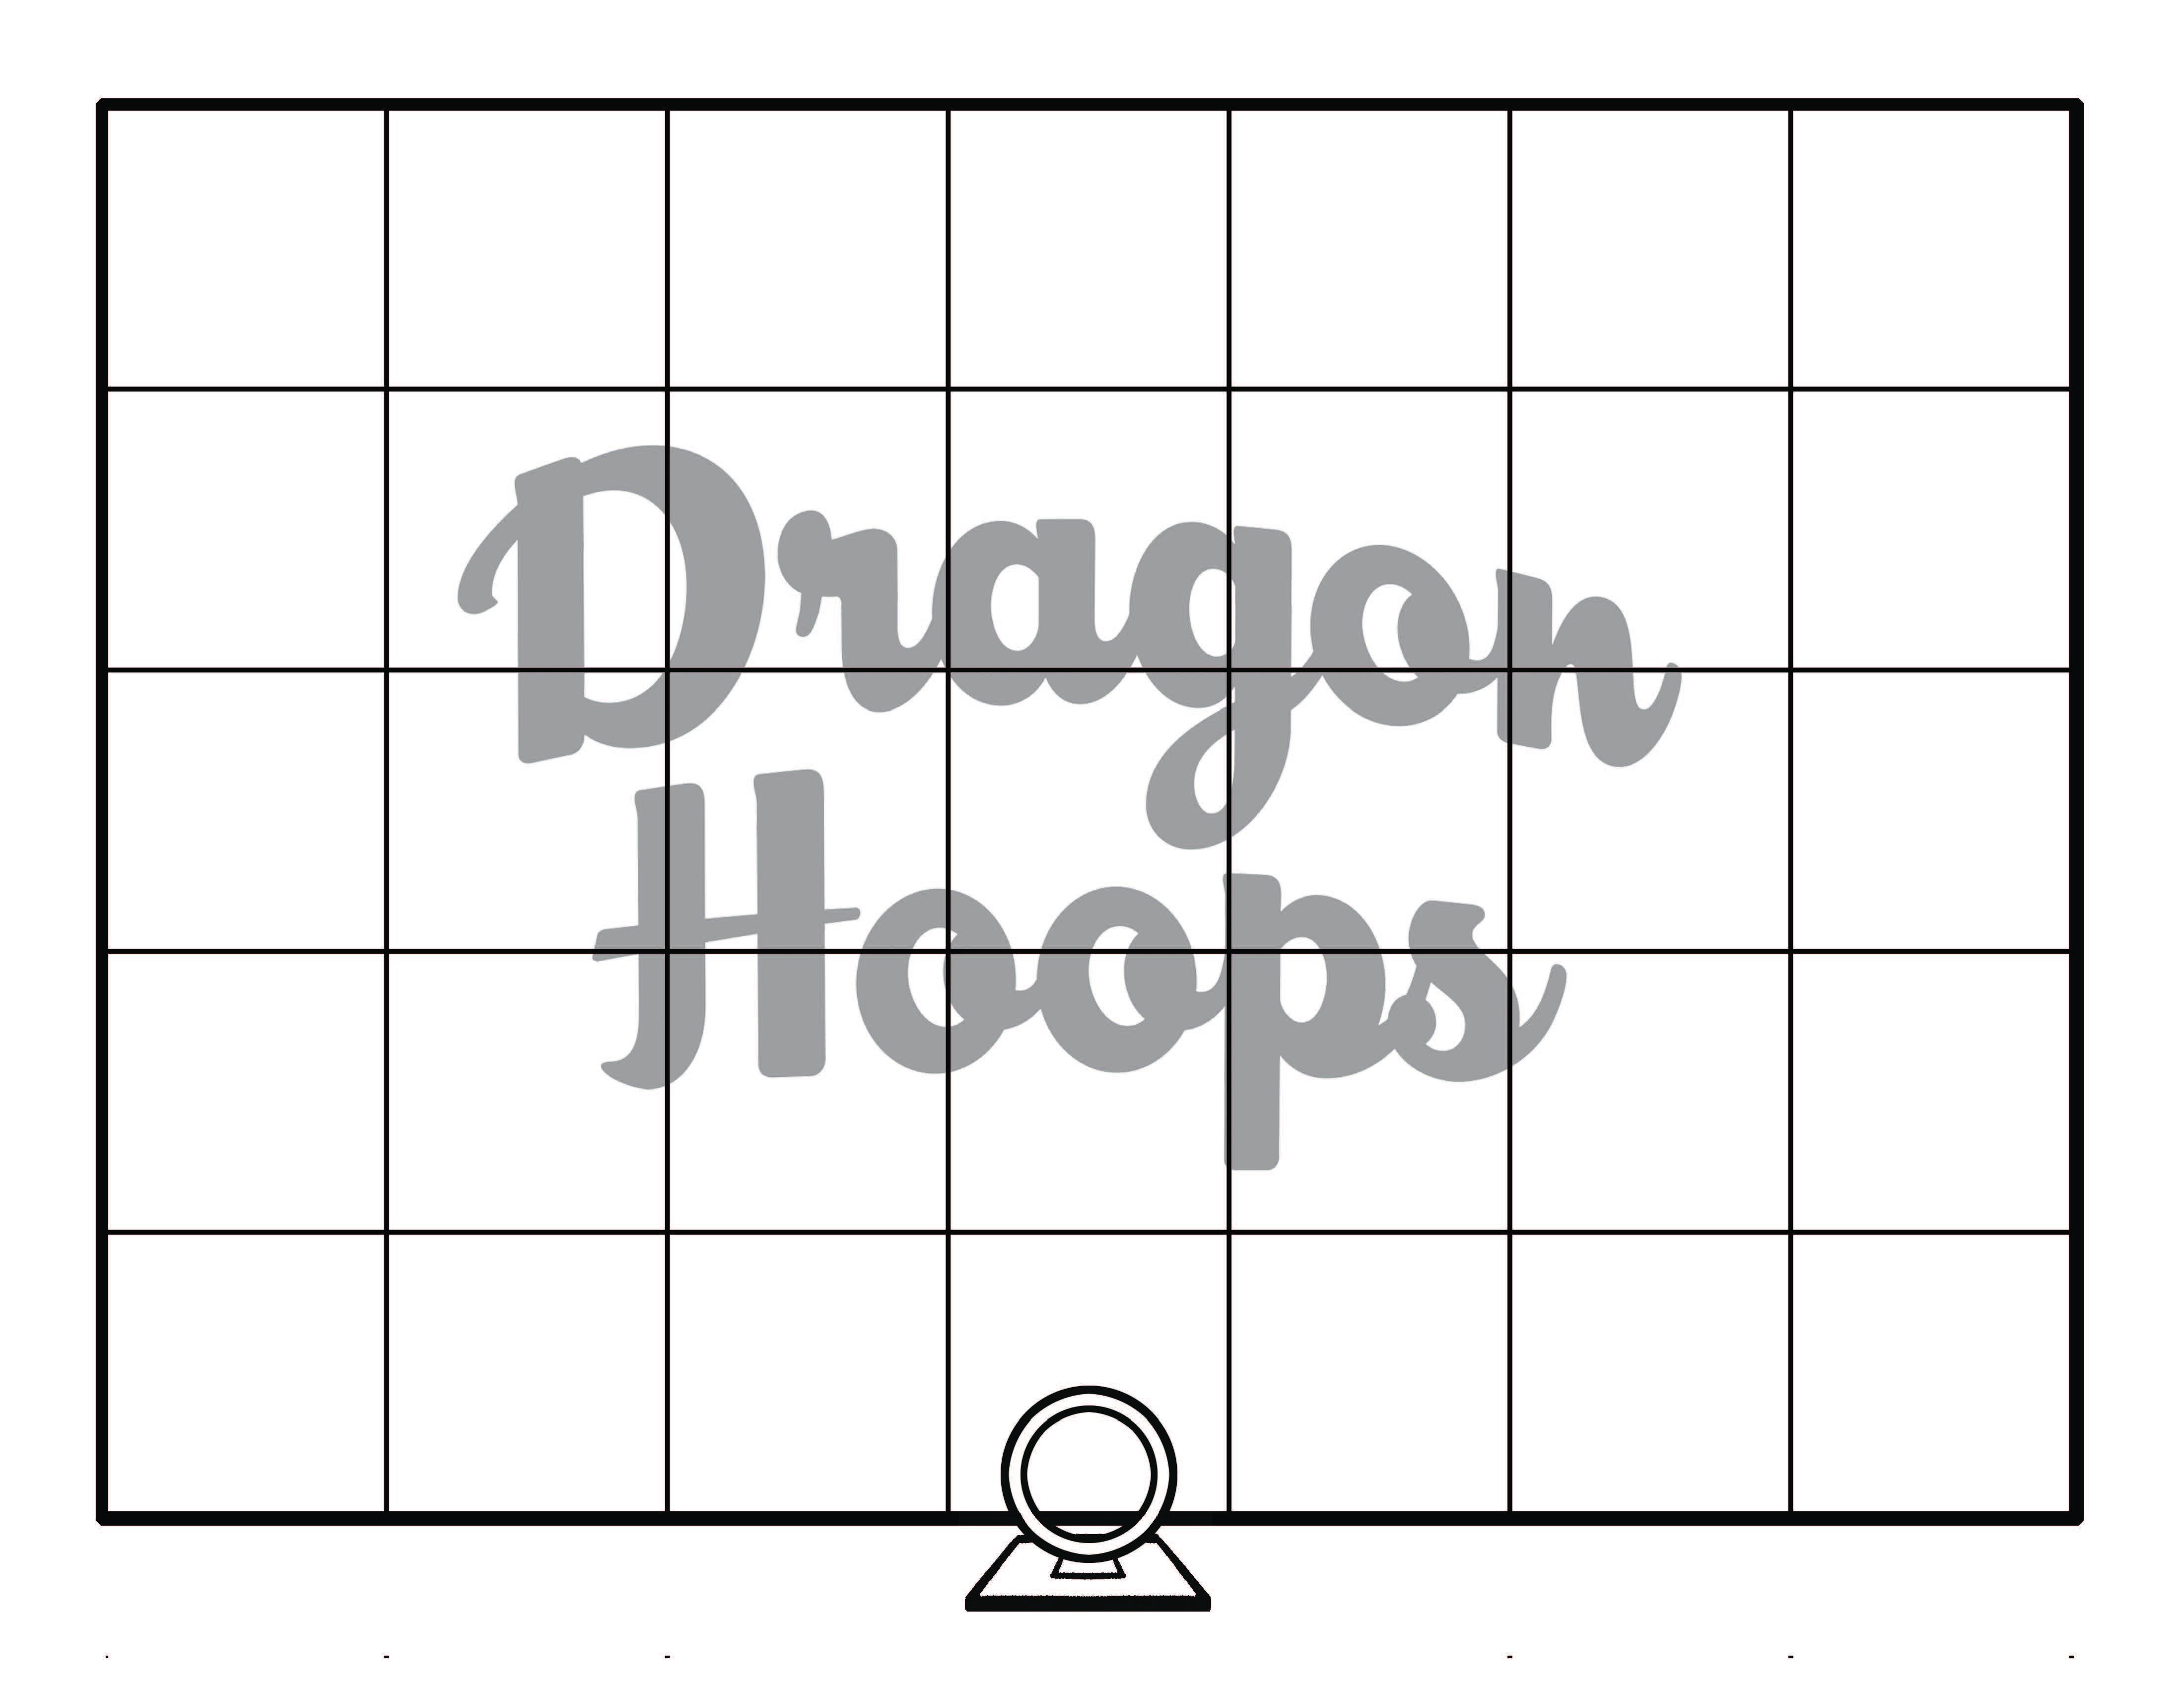 Dragon Hoops Game Board